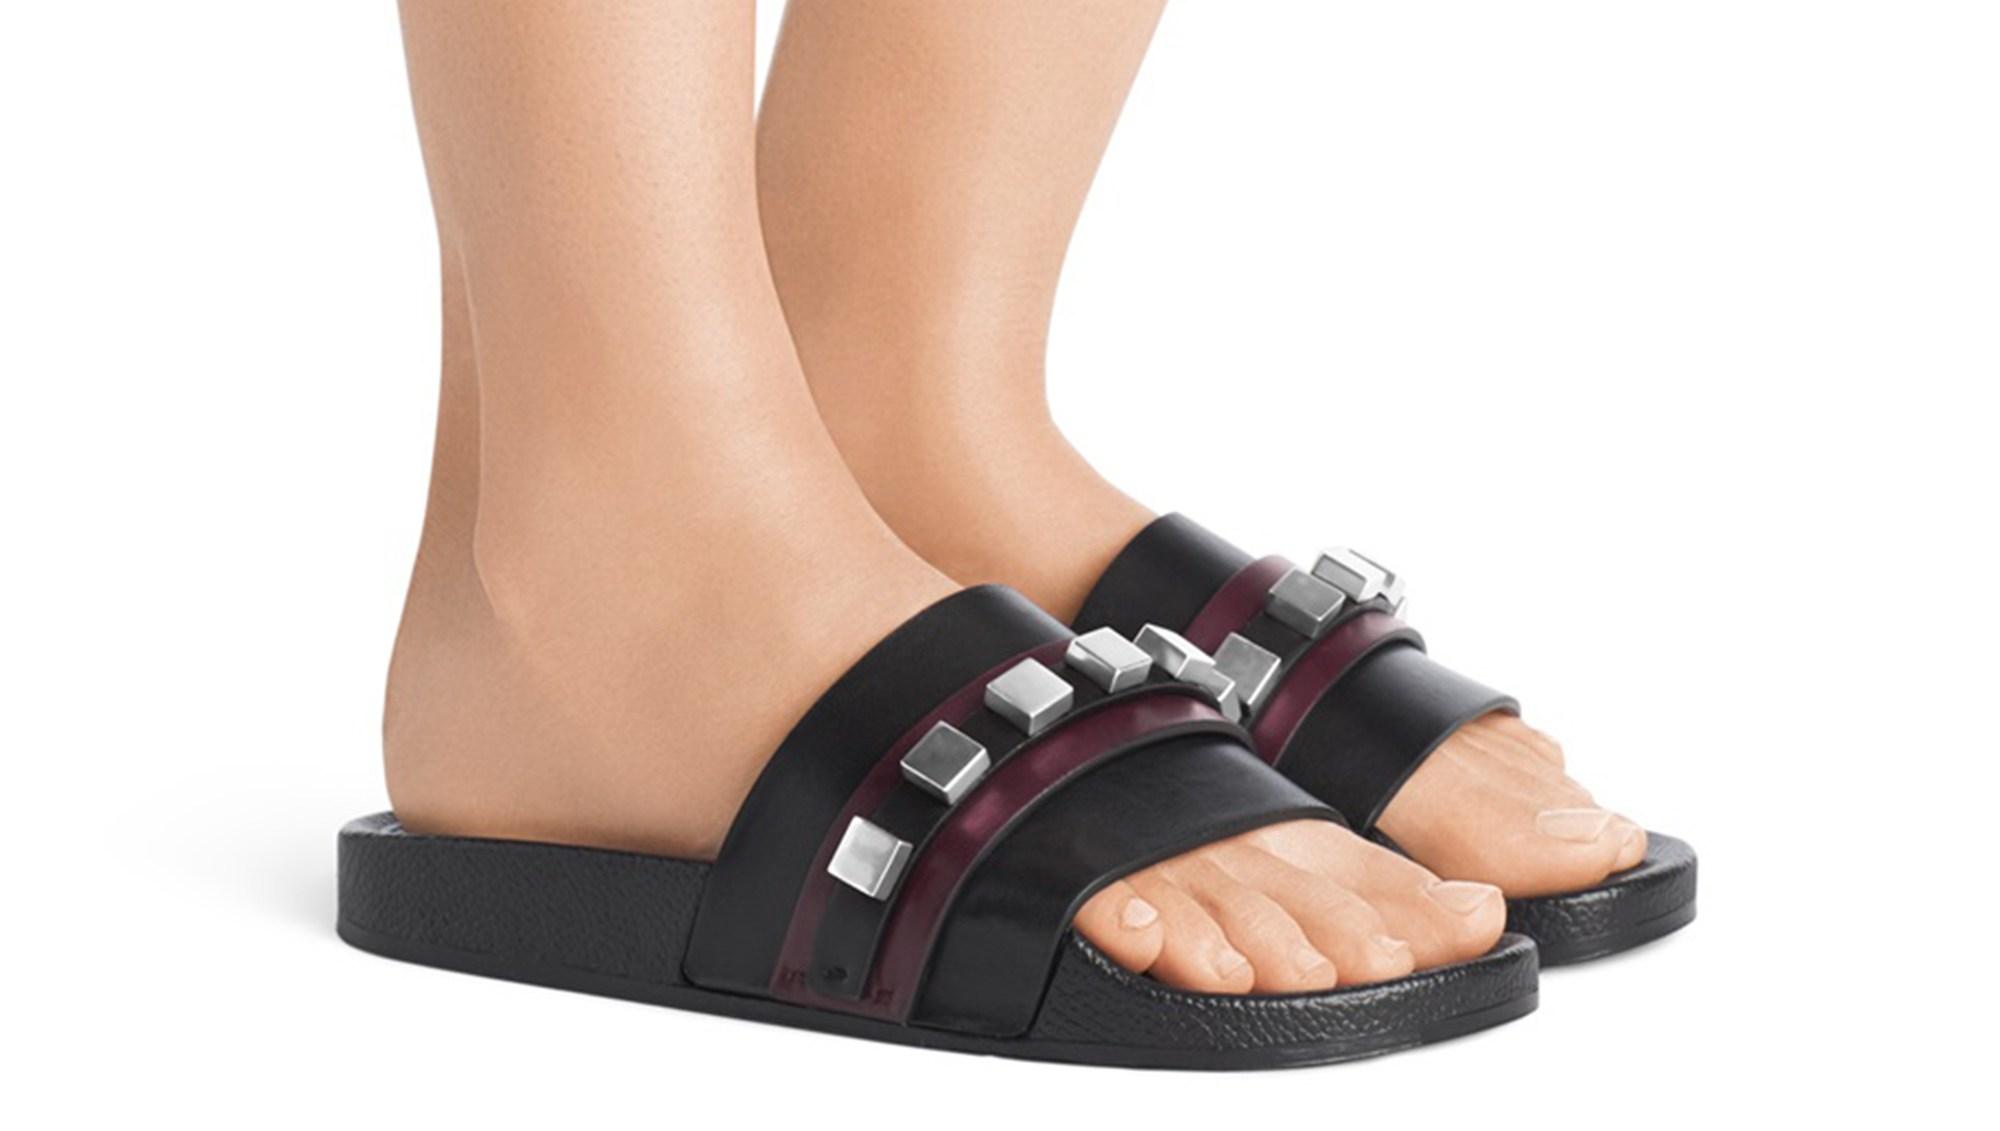 SW sandals